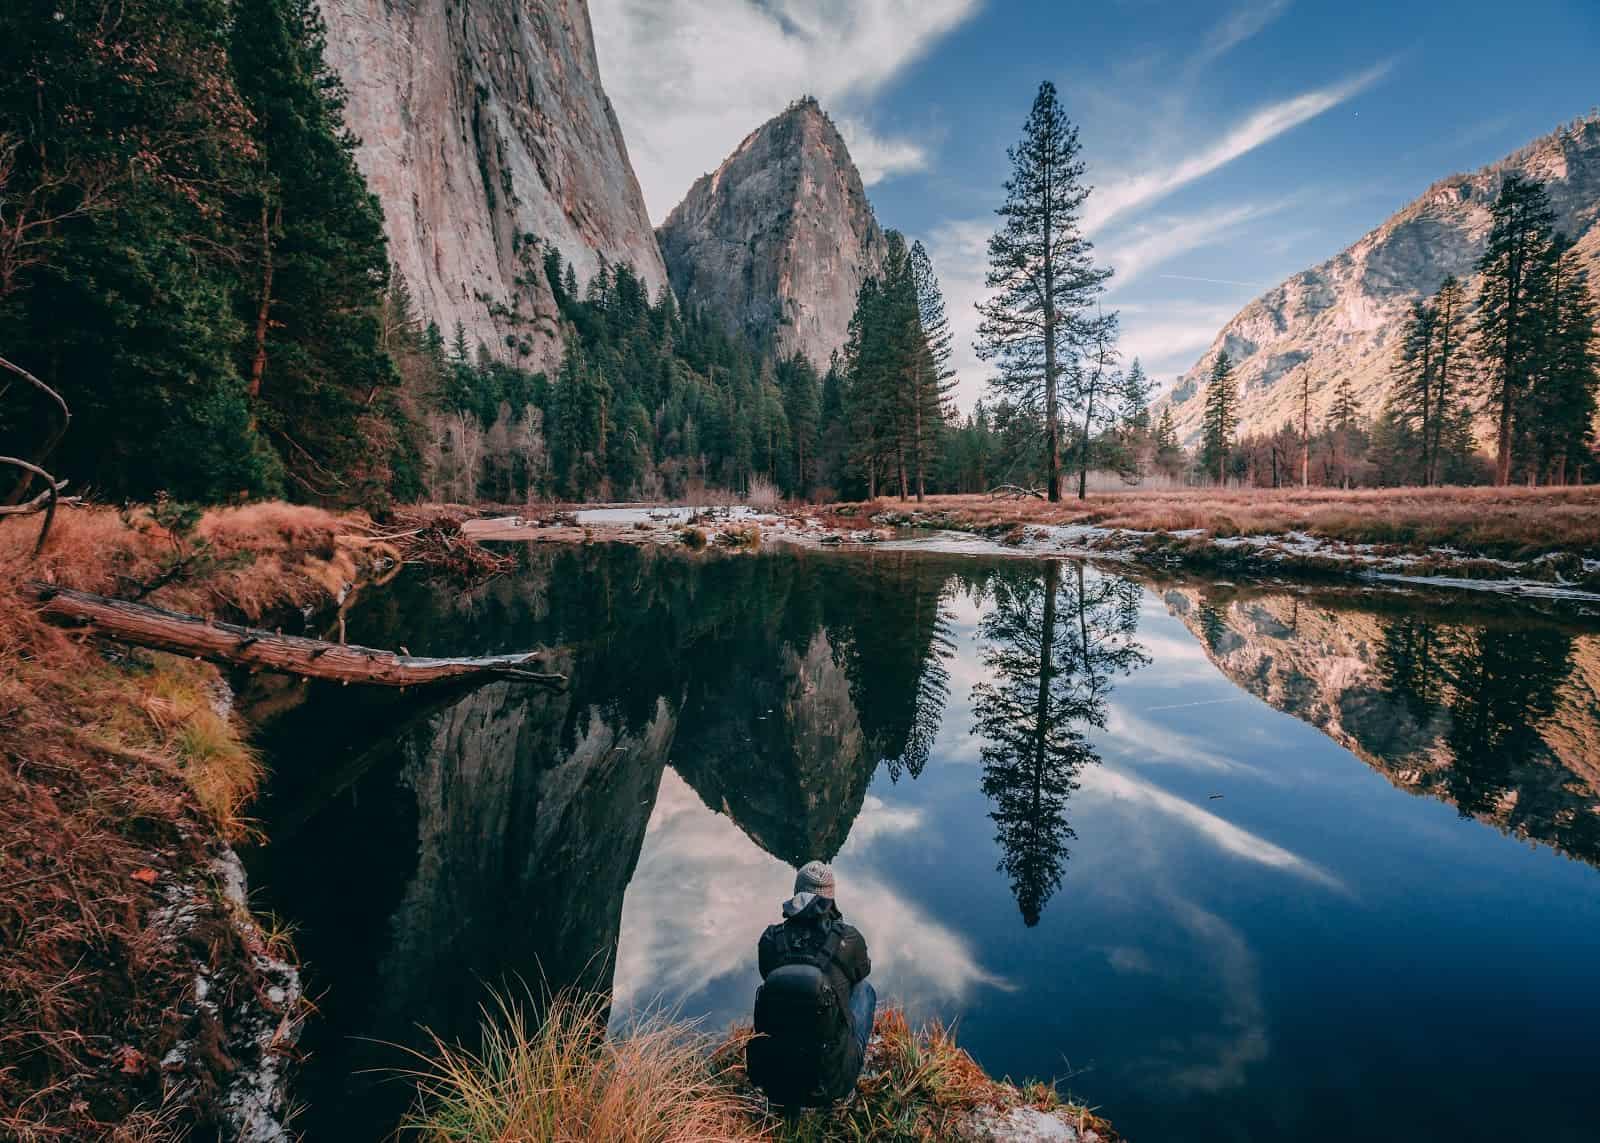 Yosemite nature scene